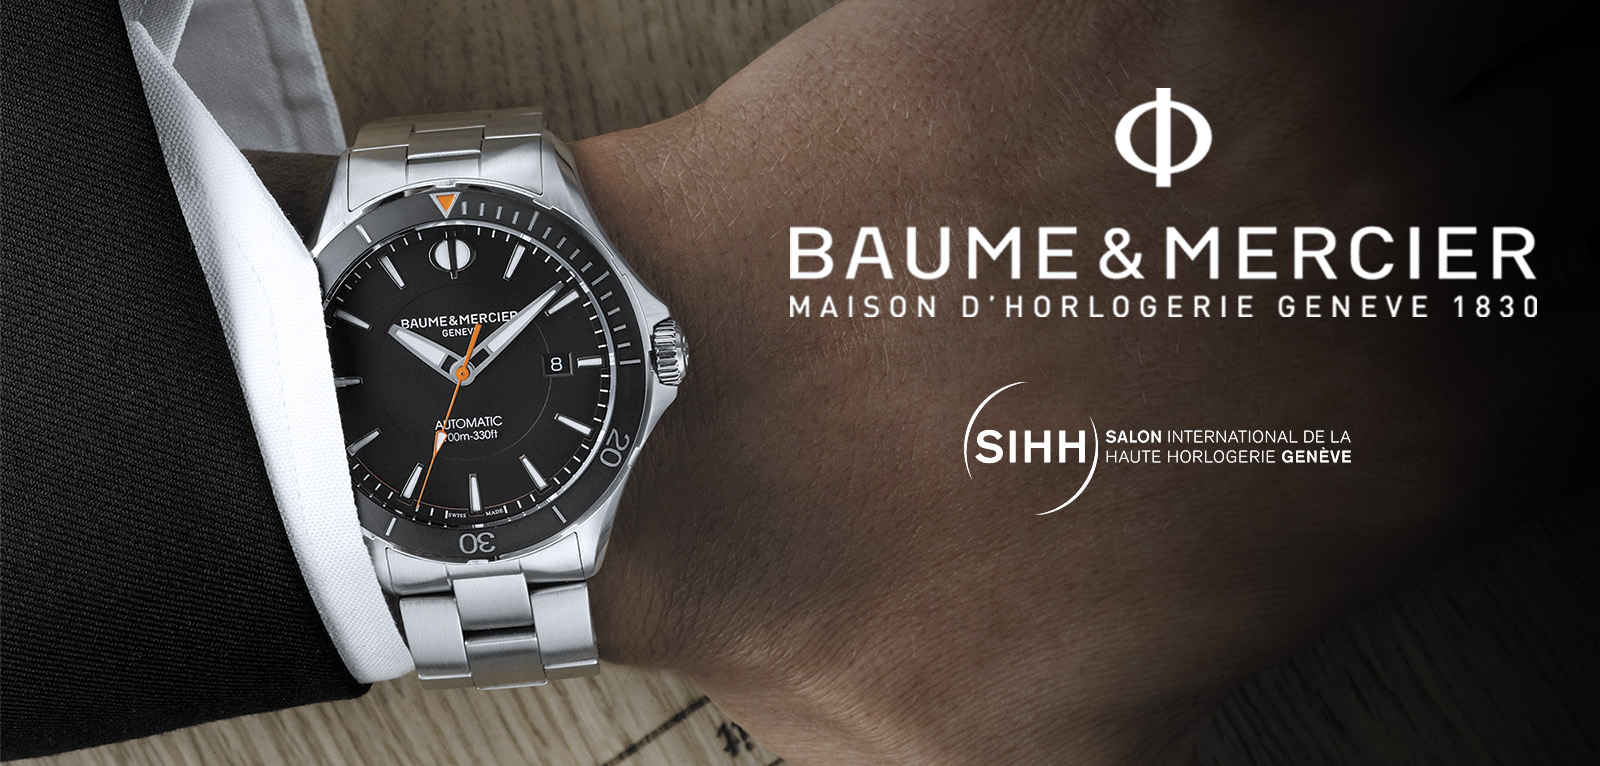 Baume & Mercier - SIHH 2017 - portada